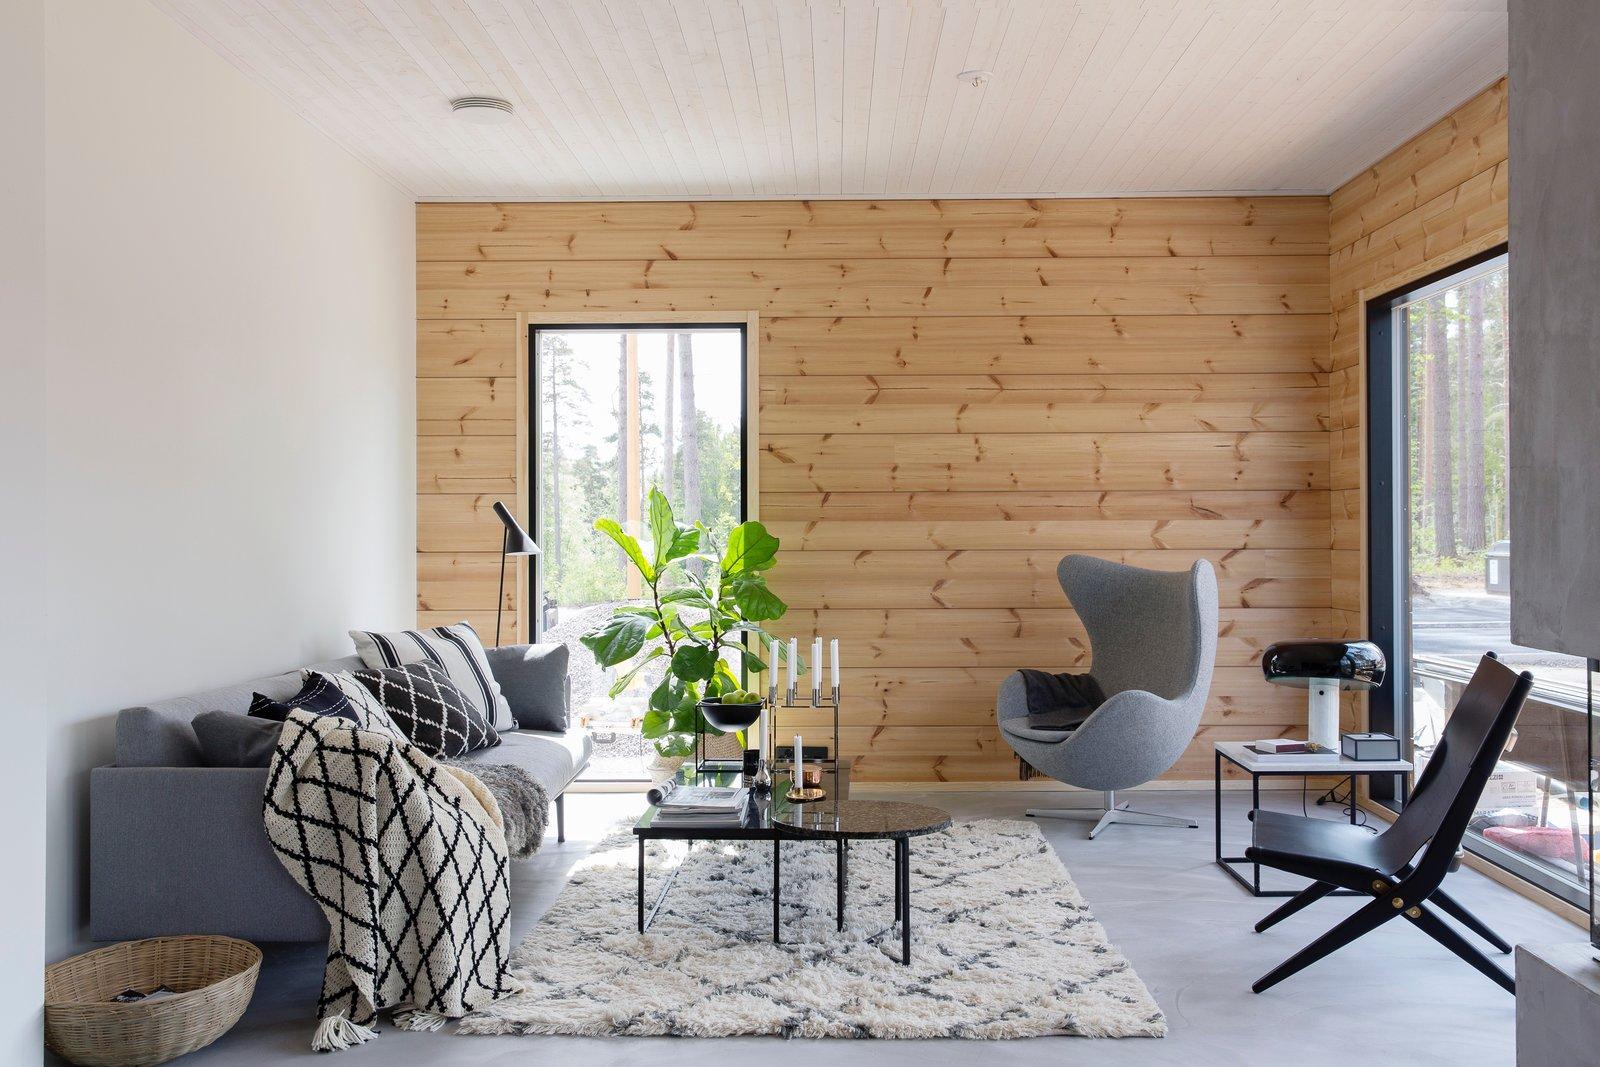 The living room of Ink, a Honka Fusion home furnished by interior designer Jonna Kivilahti.